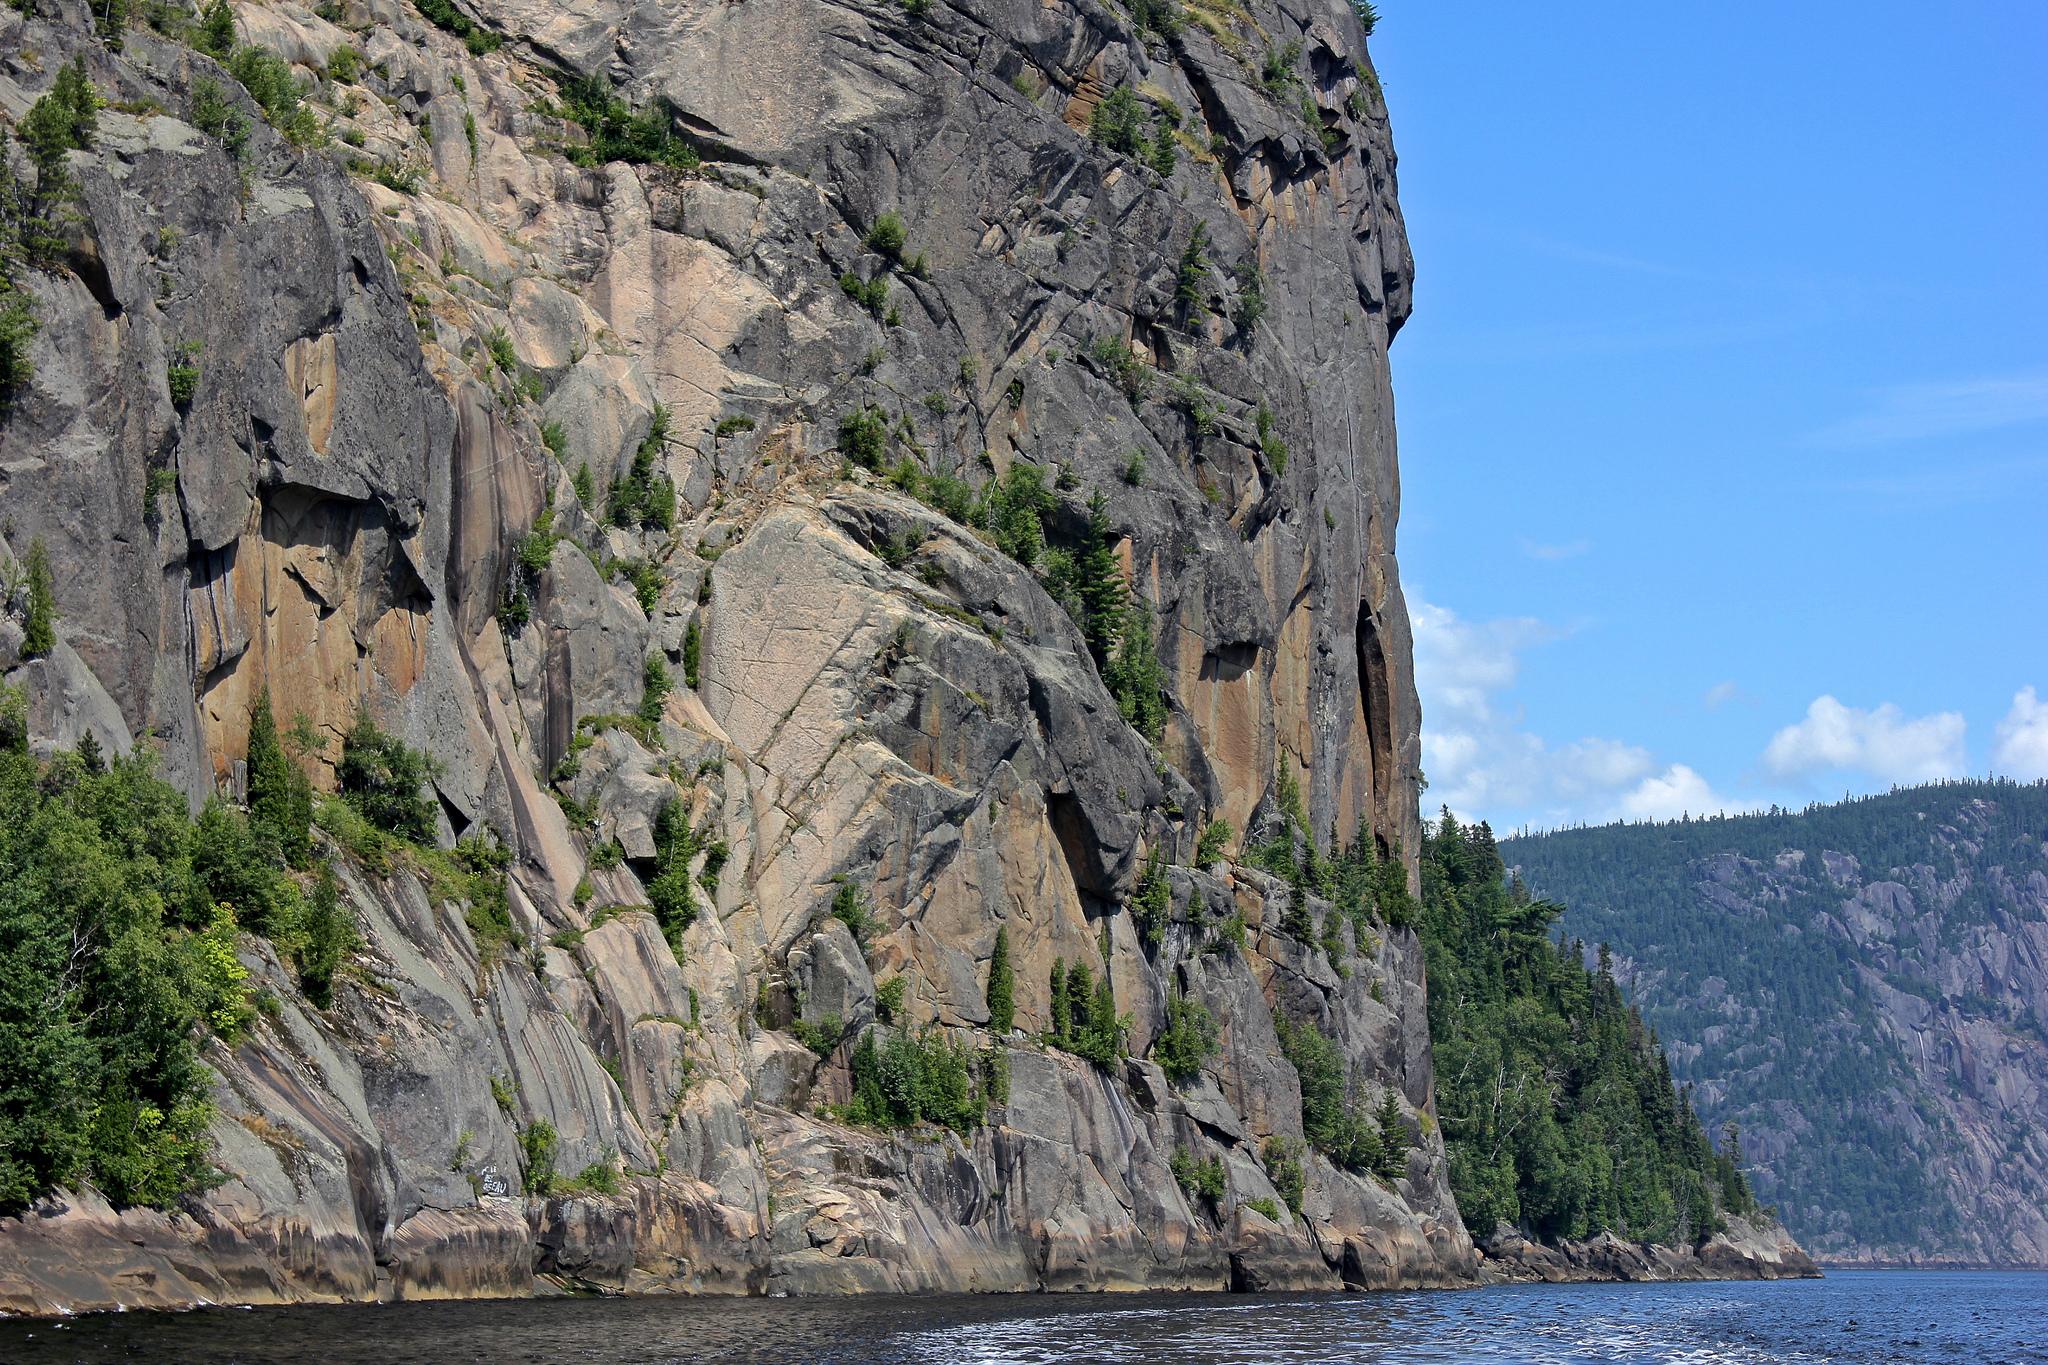 Saguenay River Fjord